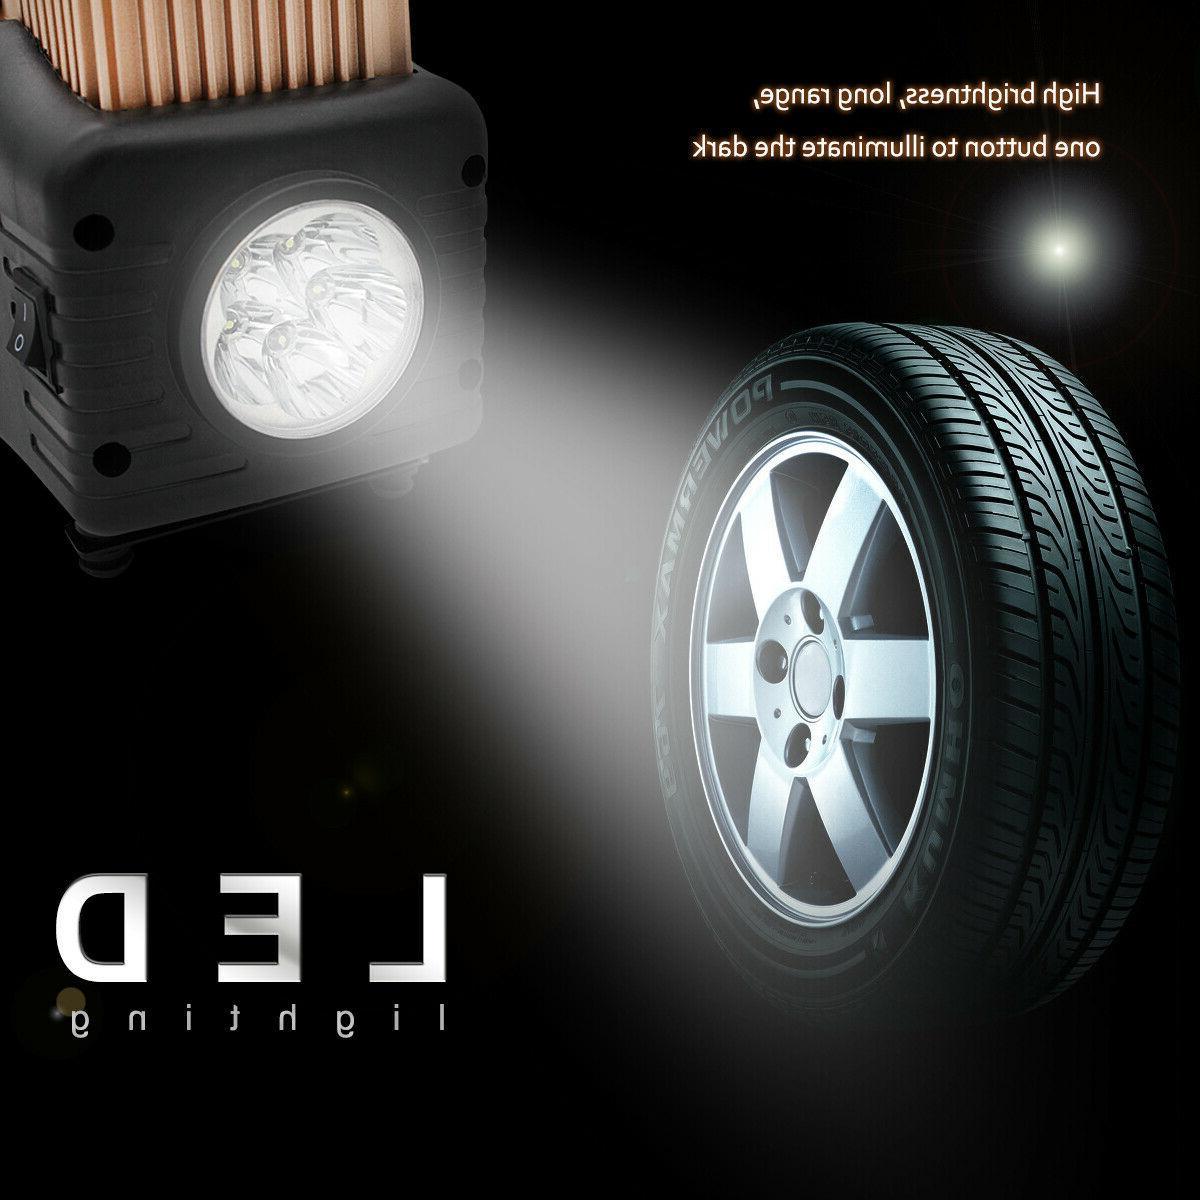 HEAVY Compressor Car Tire Pump Inflator Double